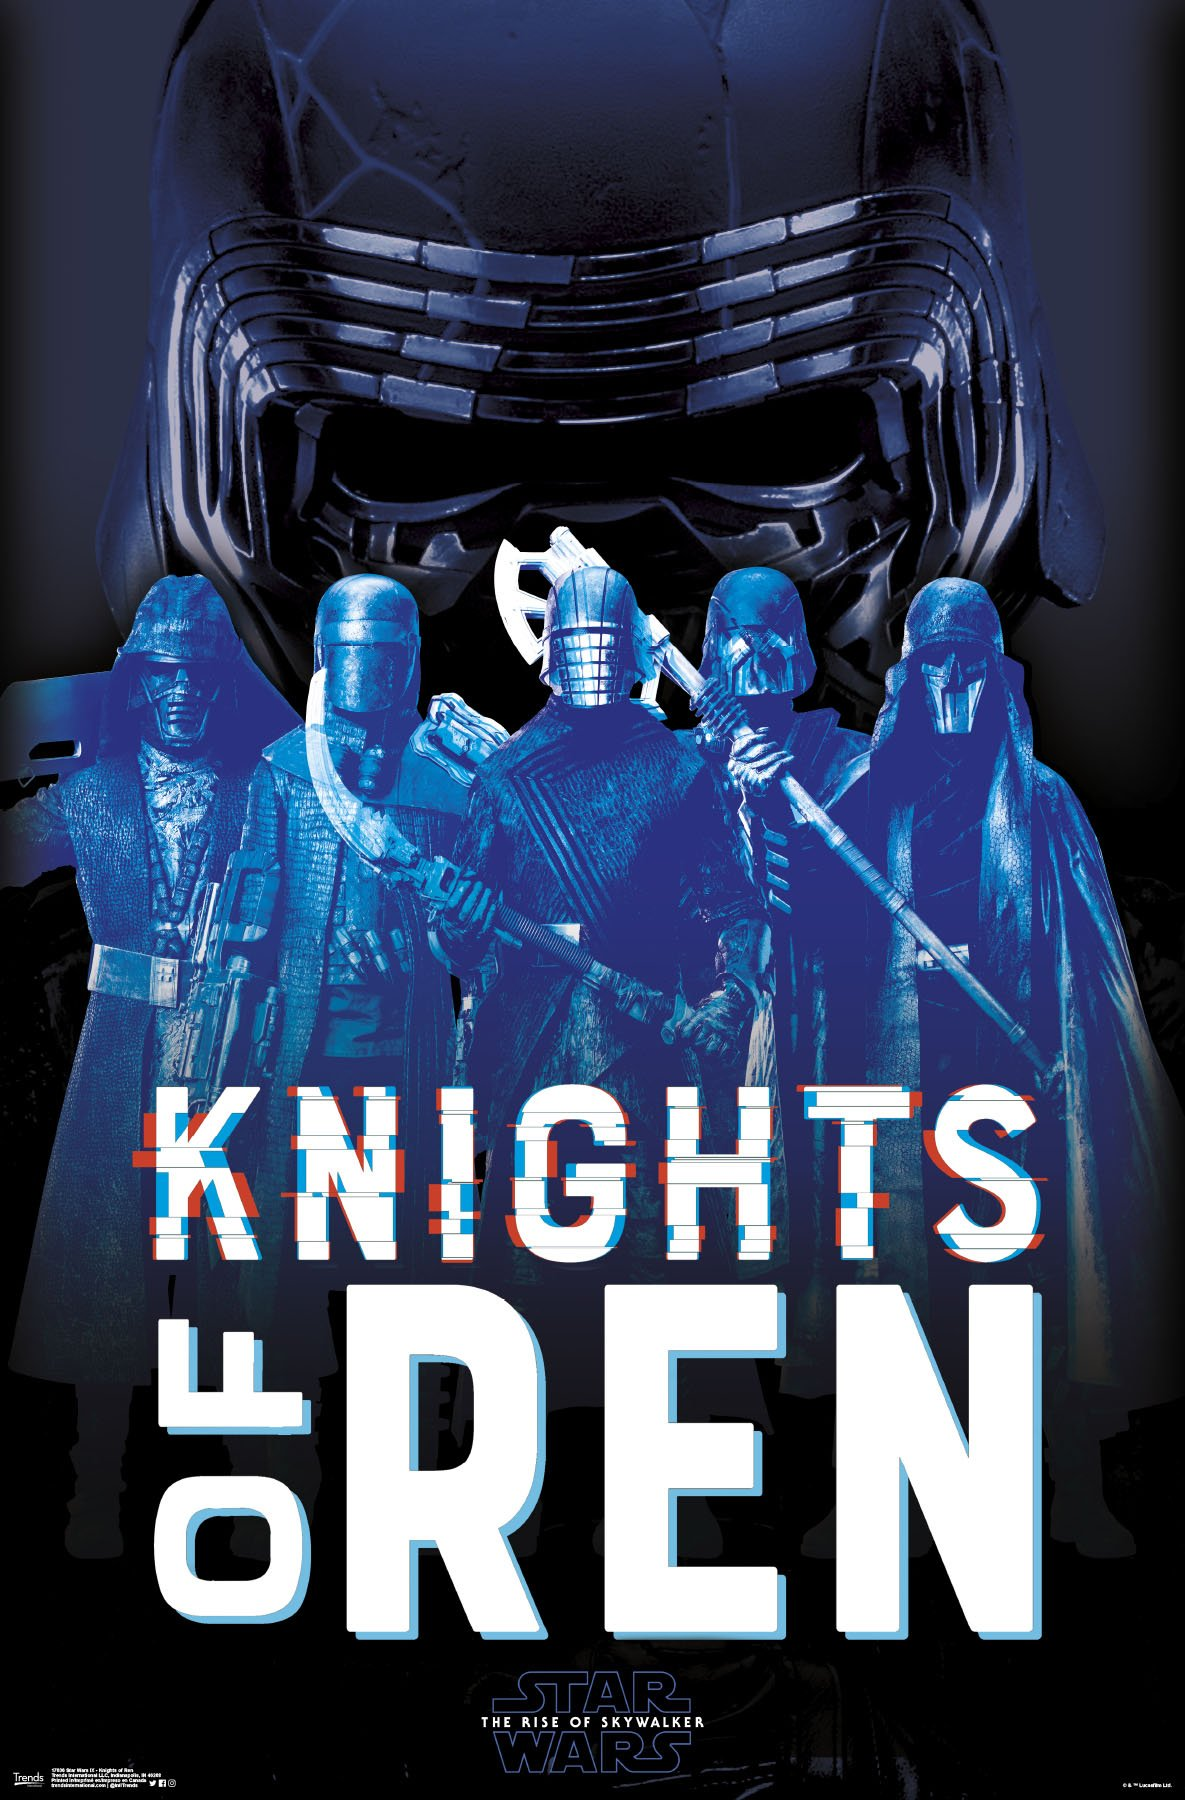 Star Wars Knights Of Ren poster